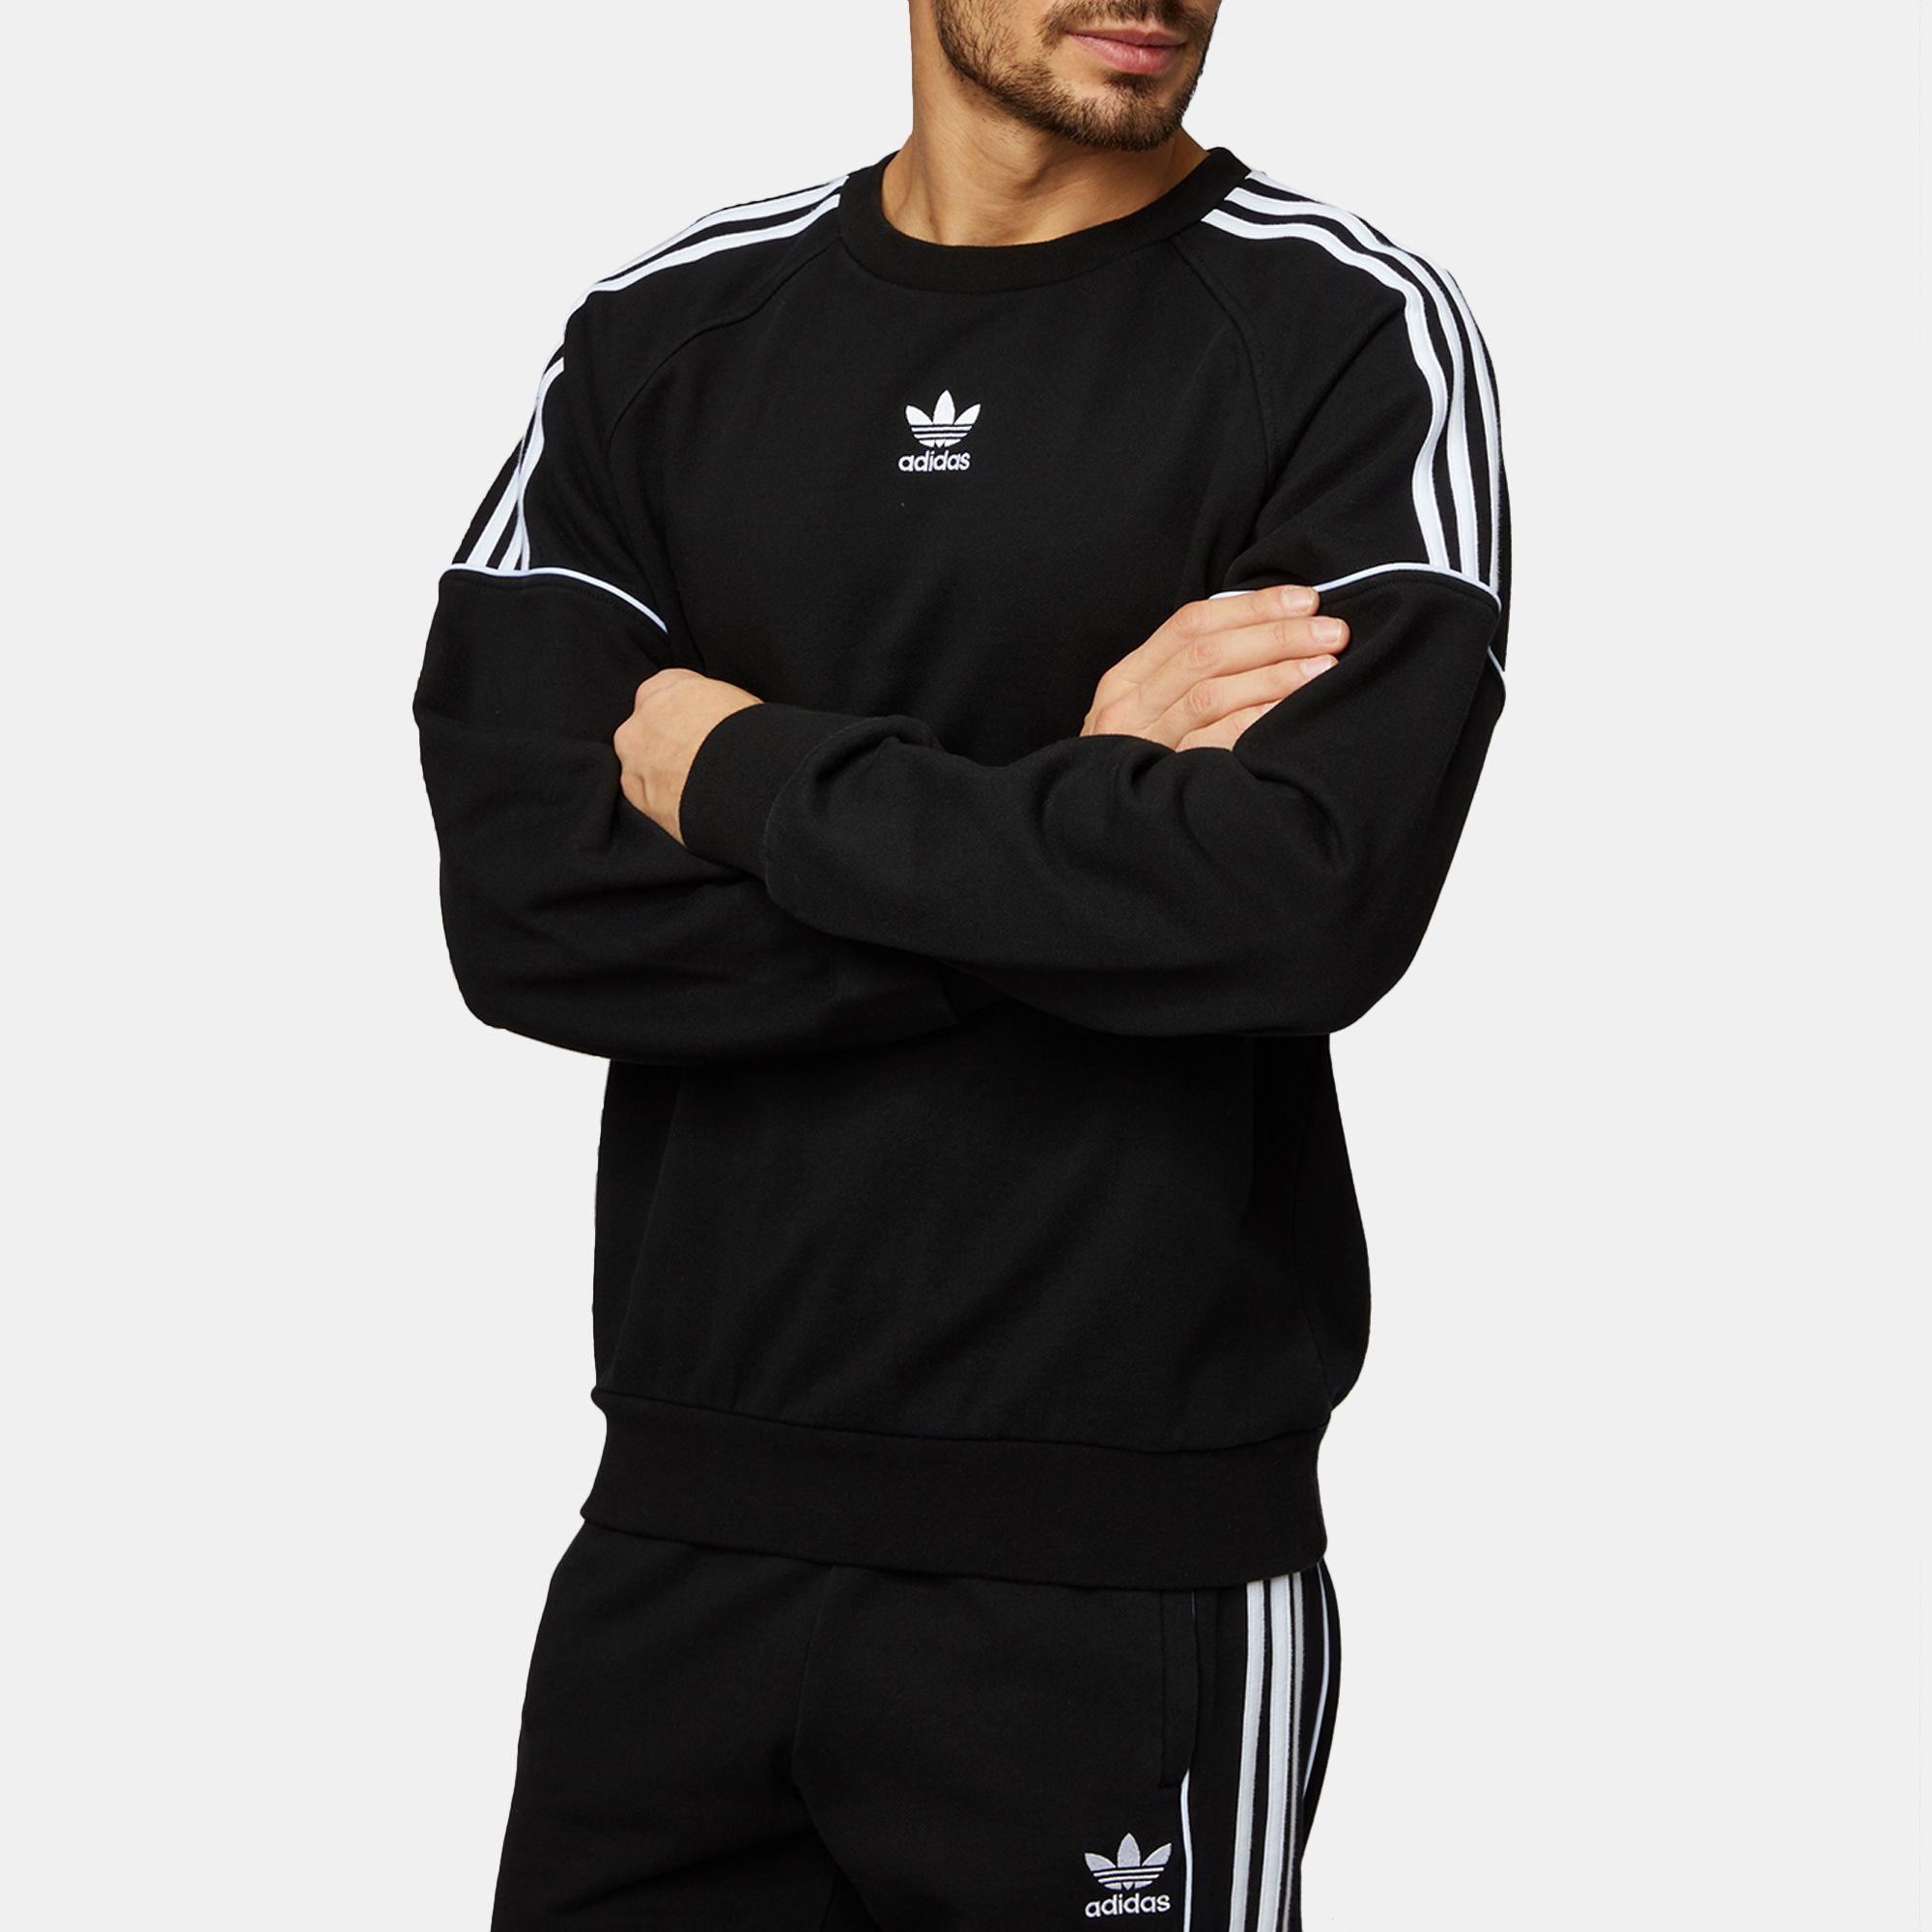 discount best value official images adidas Originals Pipe Sweatshirt   Sweatshirts   Hoodies and ...